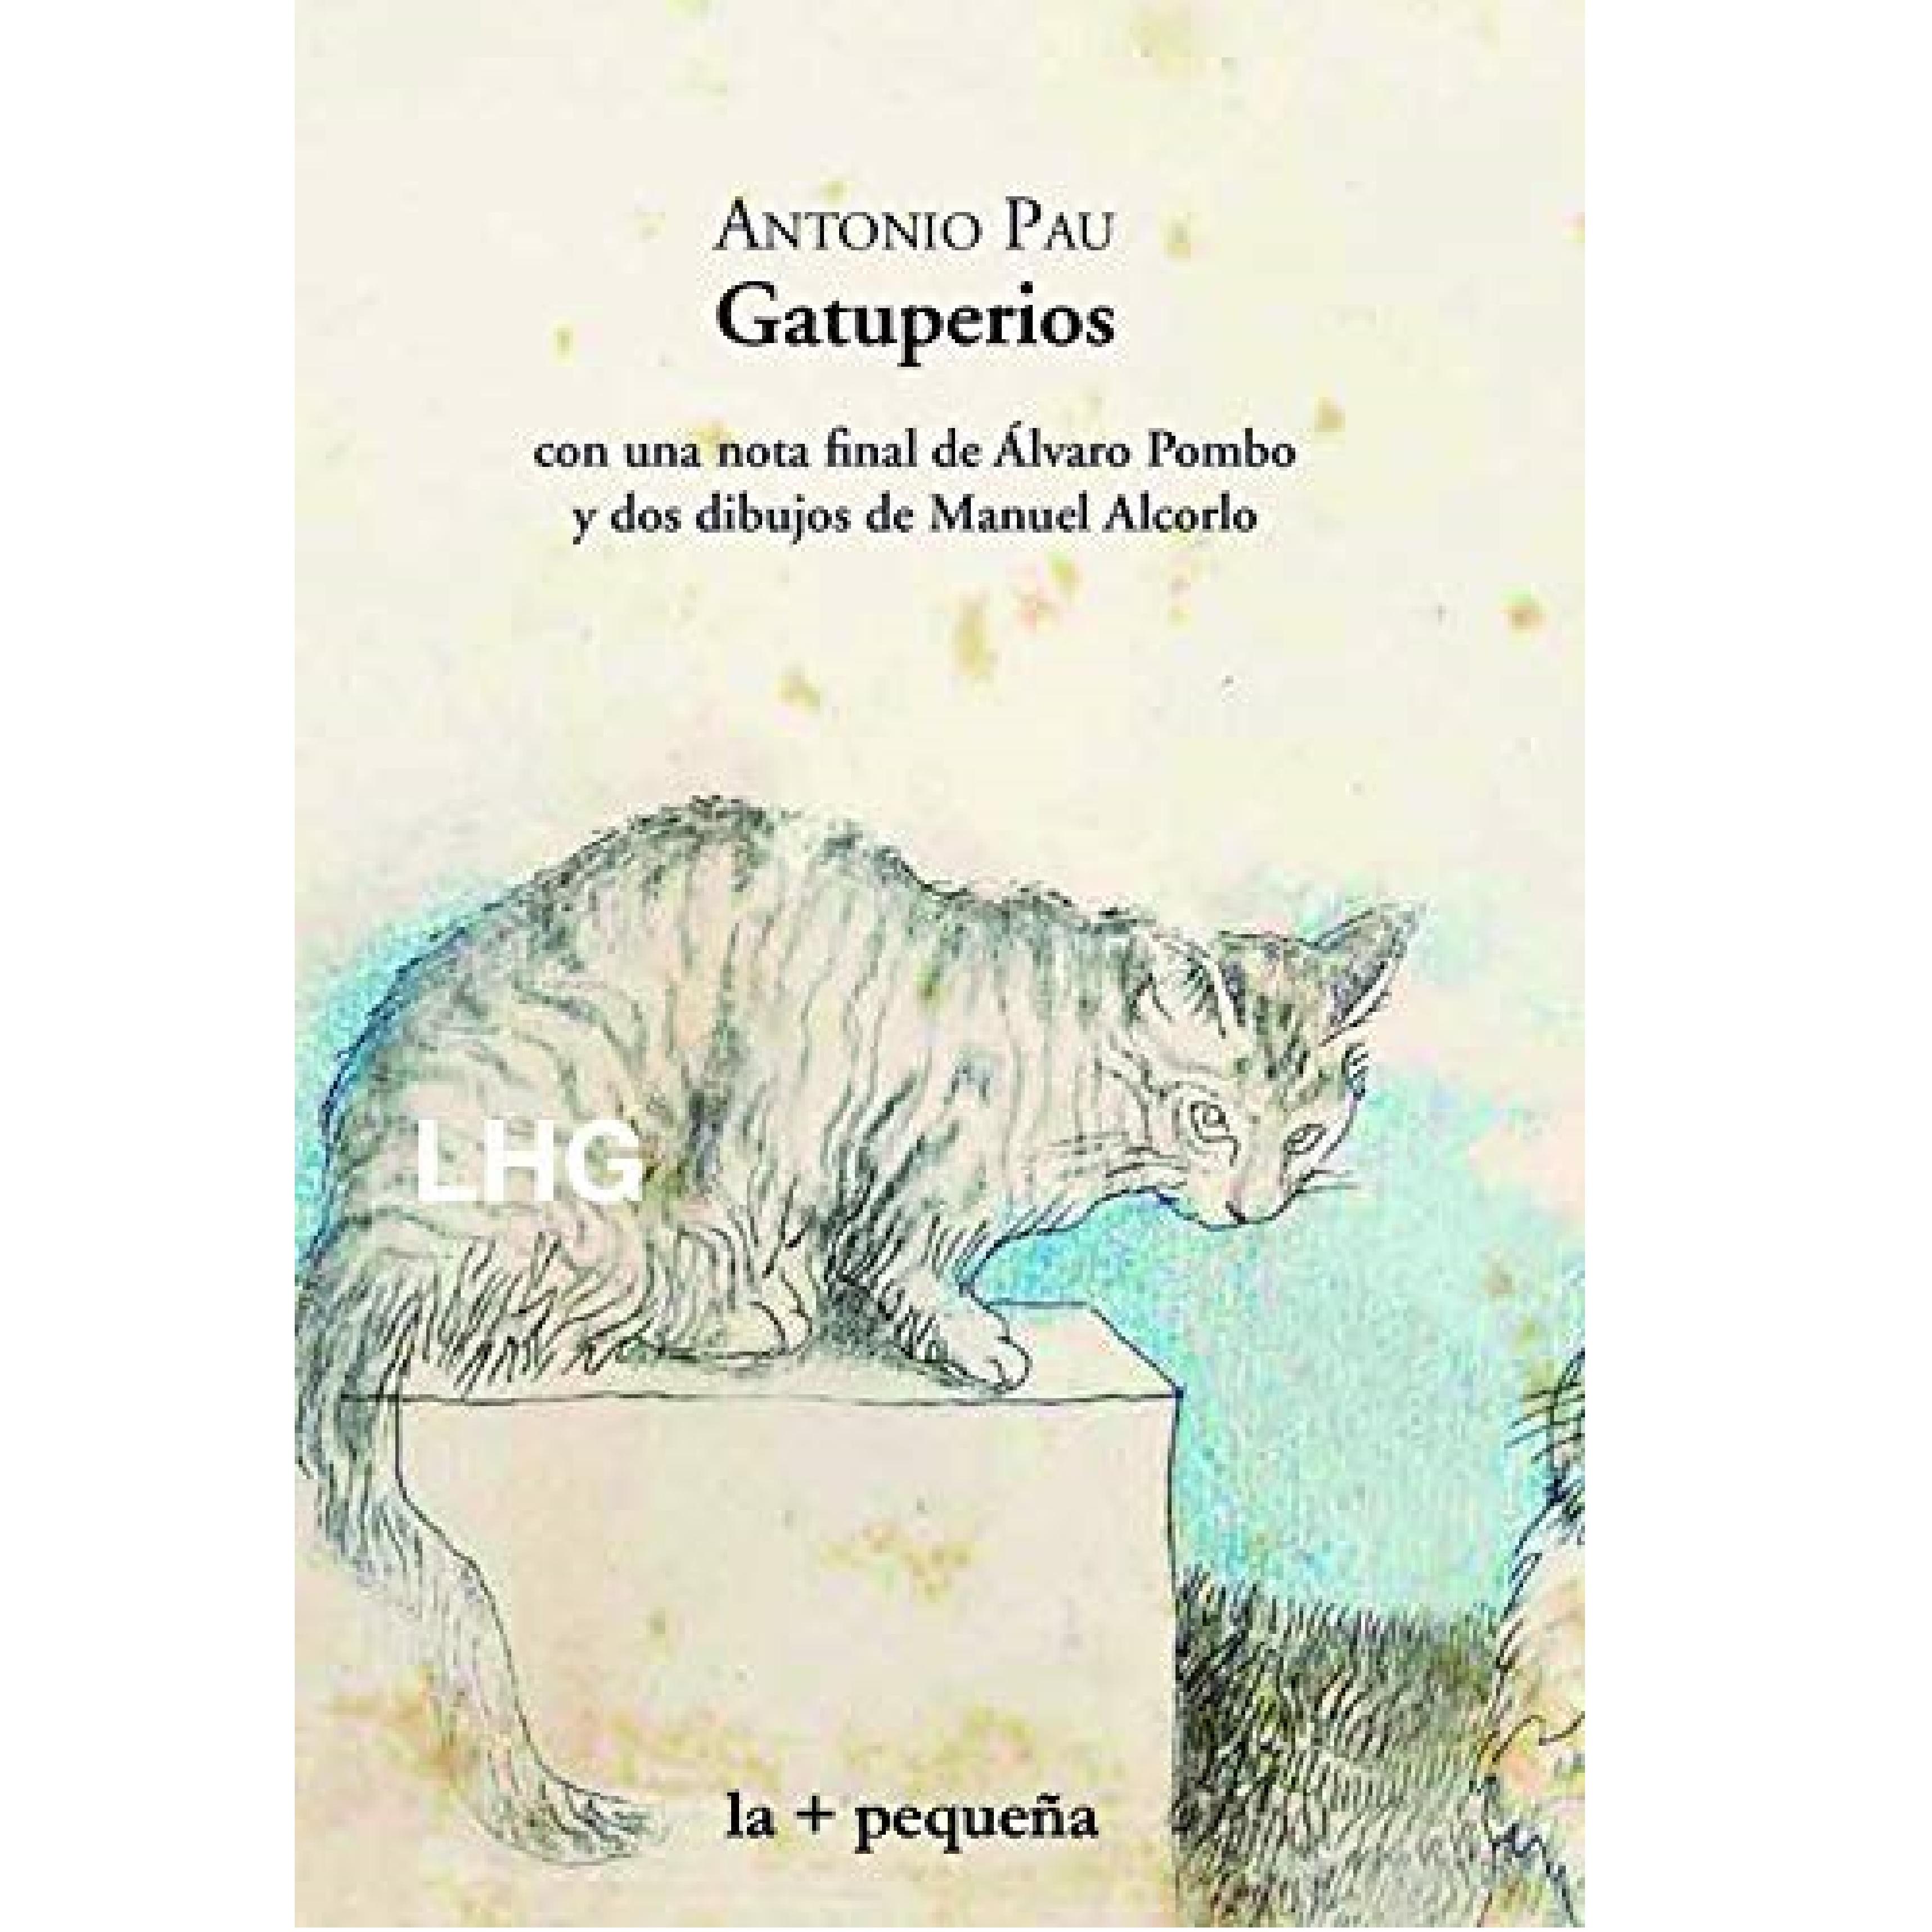 Portada de 'Gatuperios', de Antono Pau.